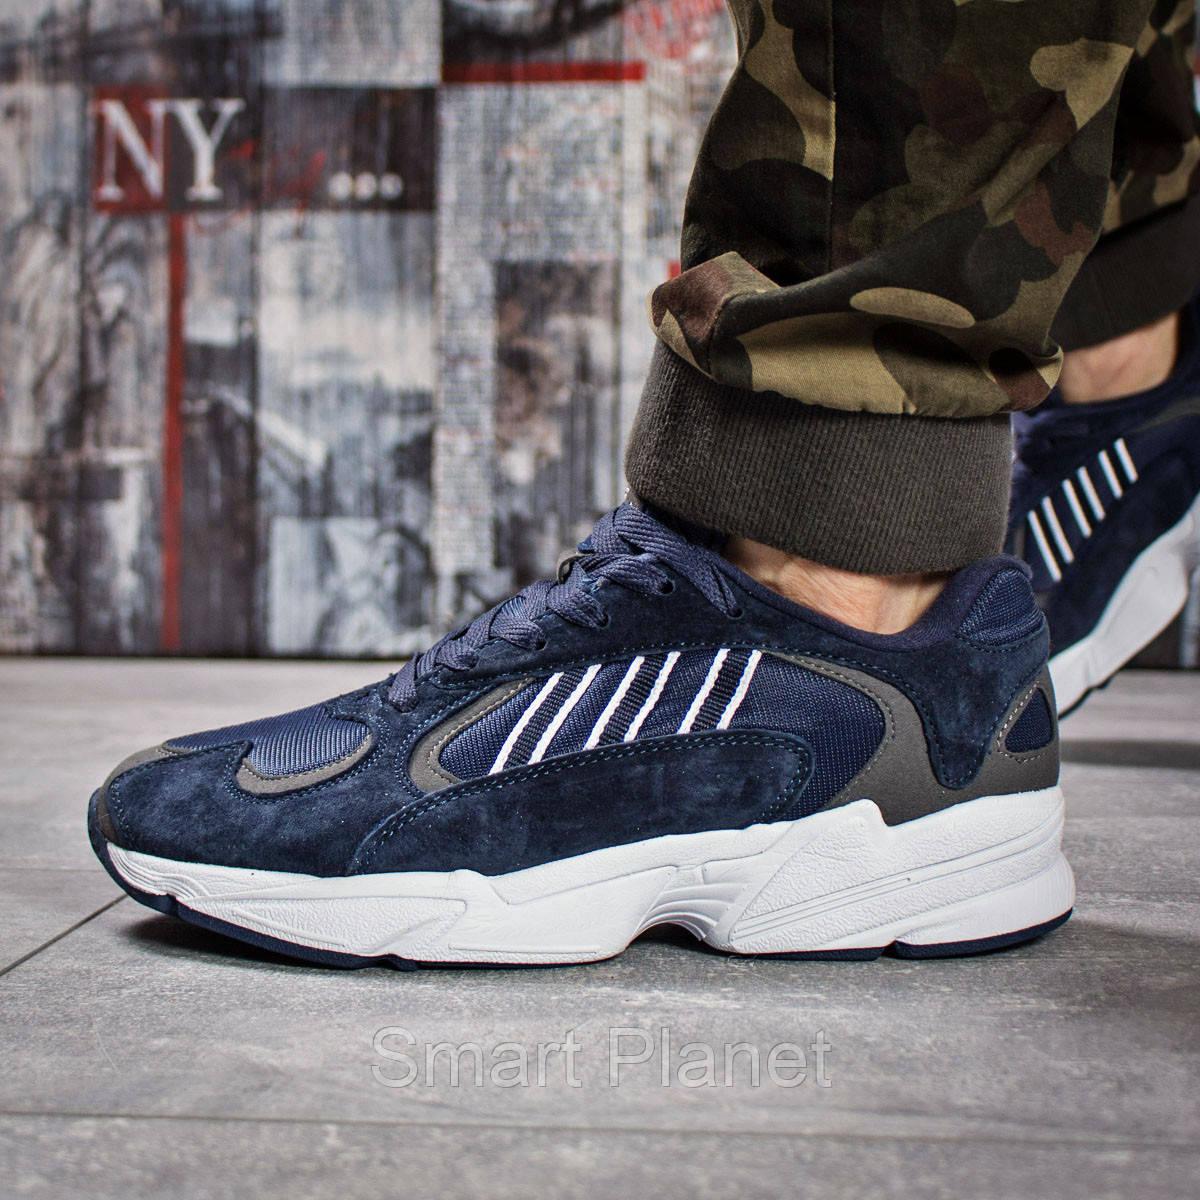 Кроссовки мужские 15933, Adidas Yung 1, темно-синие, < 43 44 45 46 > р. 43-27,5см.